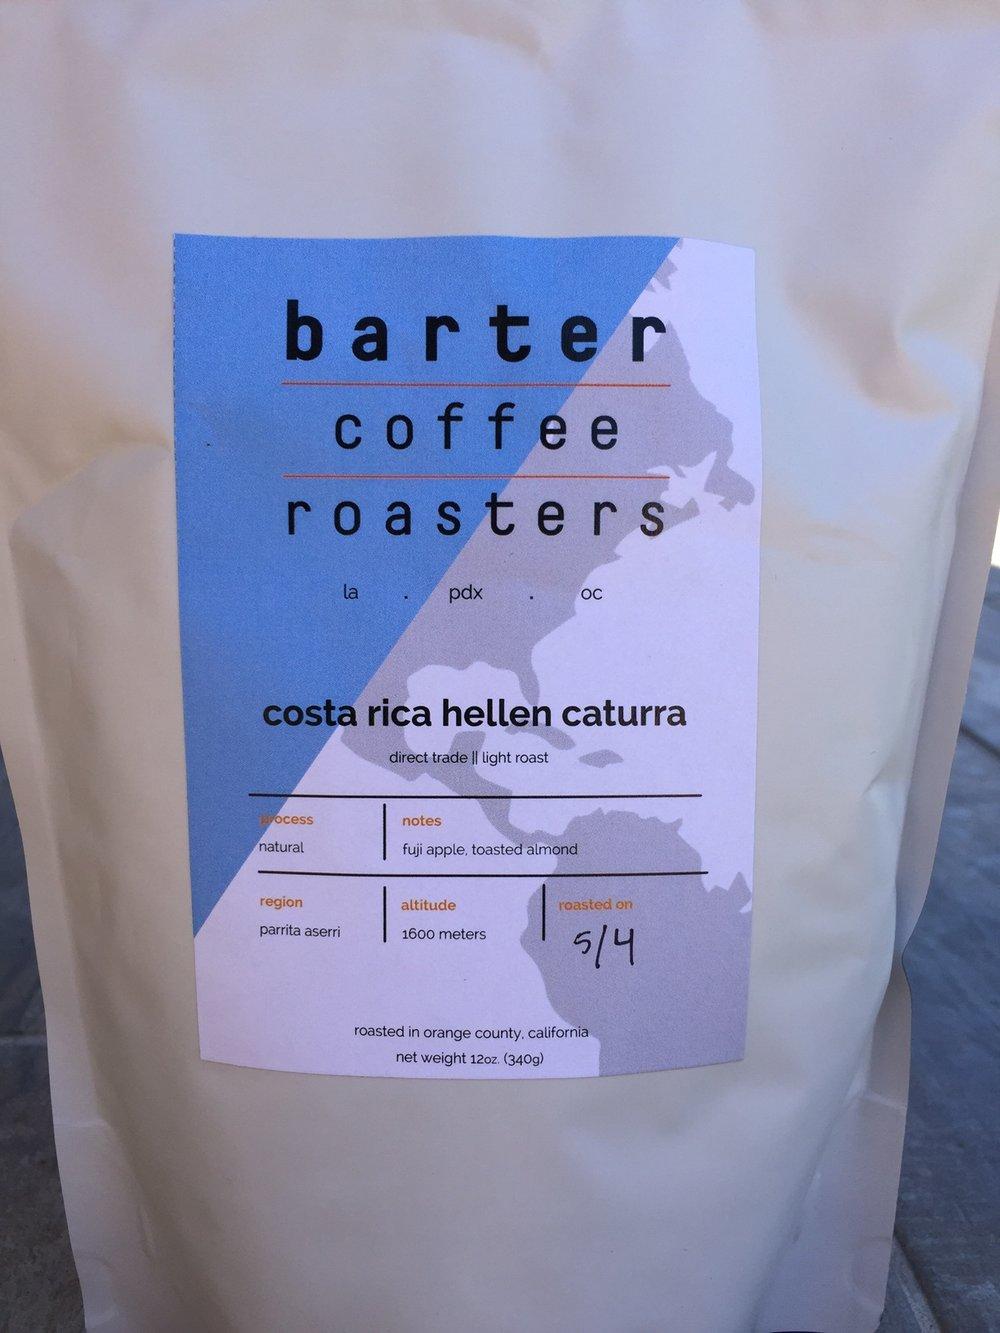 Barter Coffee Roasters Costa Rica